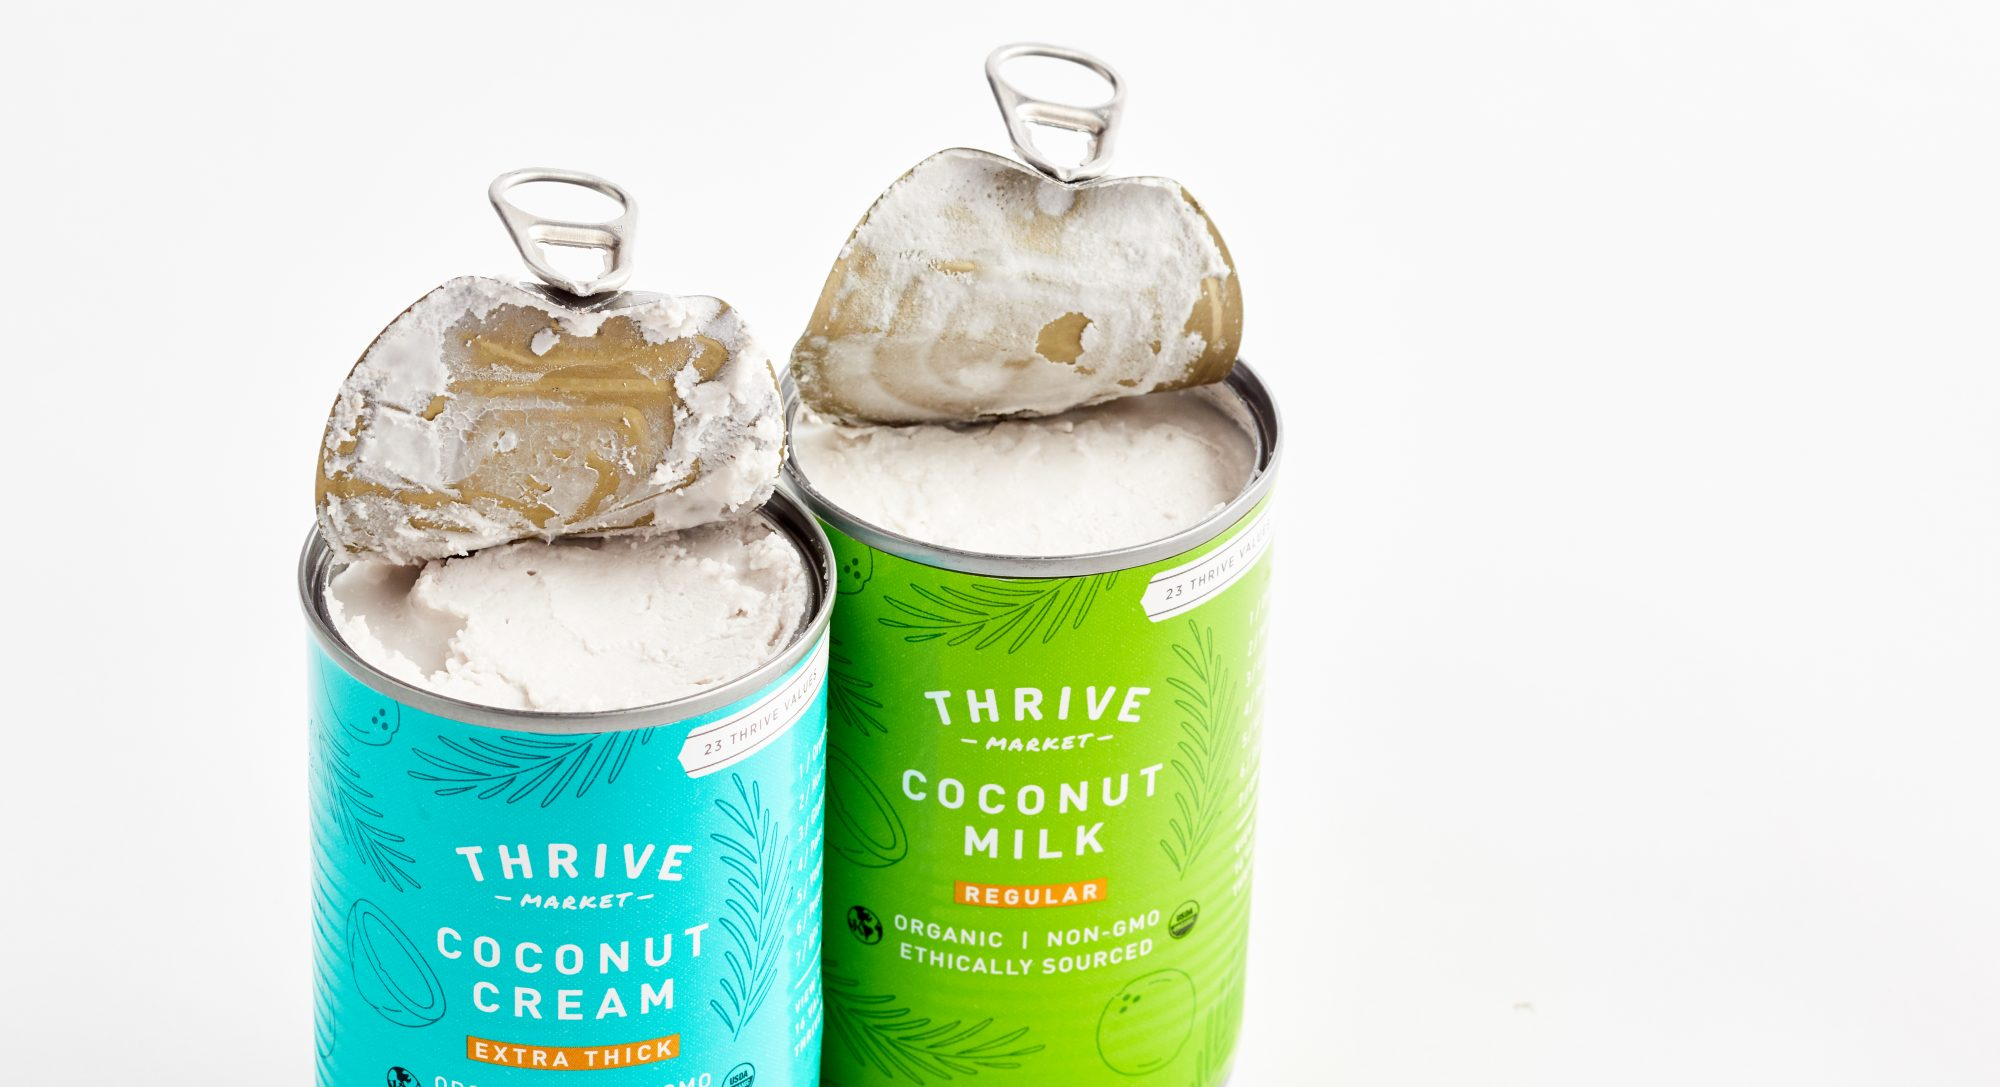 Coconut Cream vs. Coconut Milk: What's the Difference?